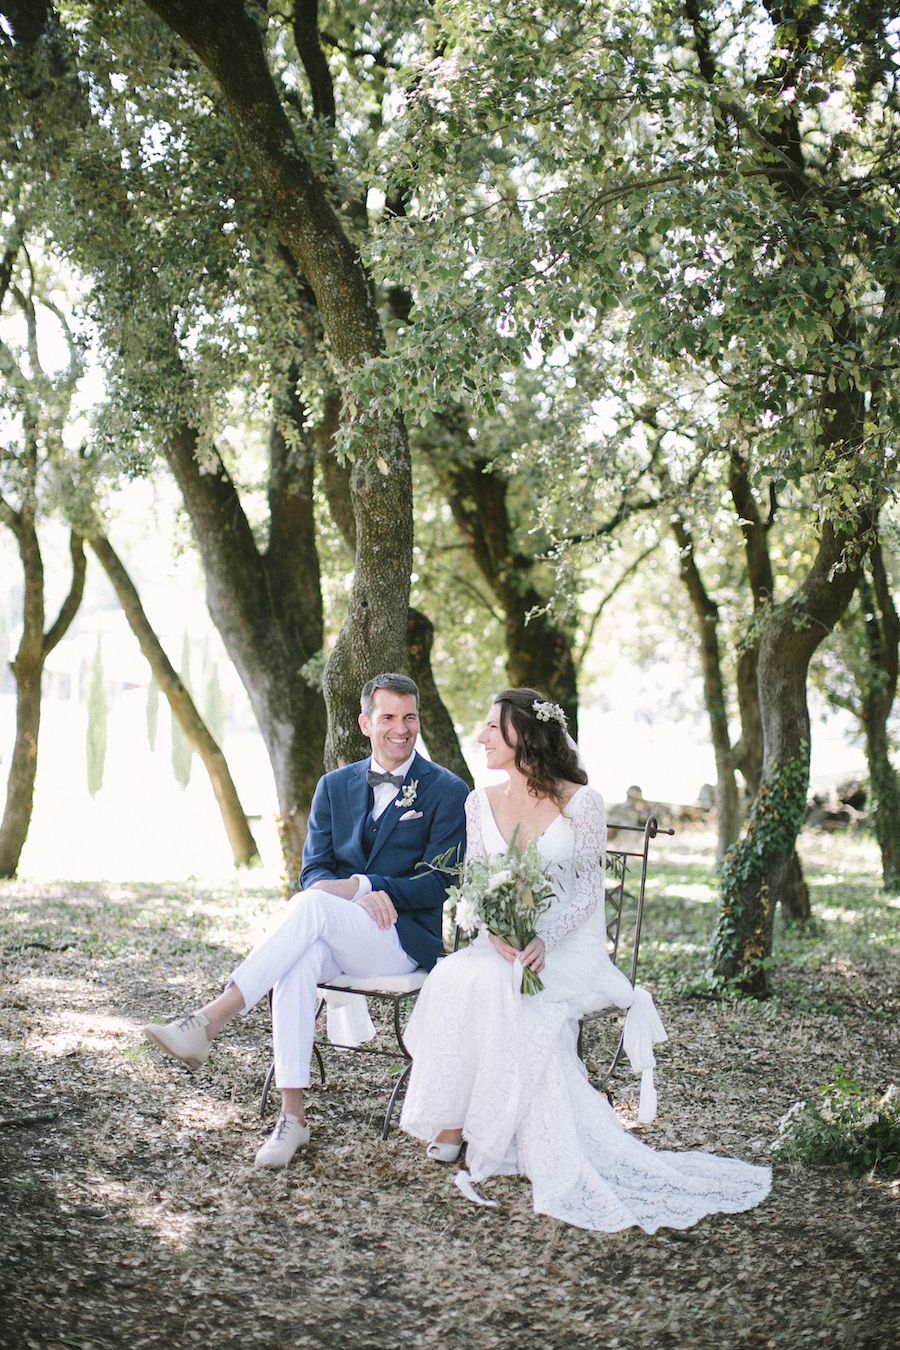 saya-photography-rustic-french-wedding-provence-domaines-de-patras-80.jpg